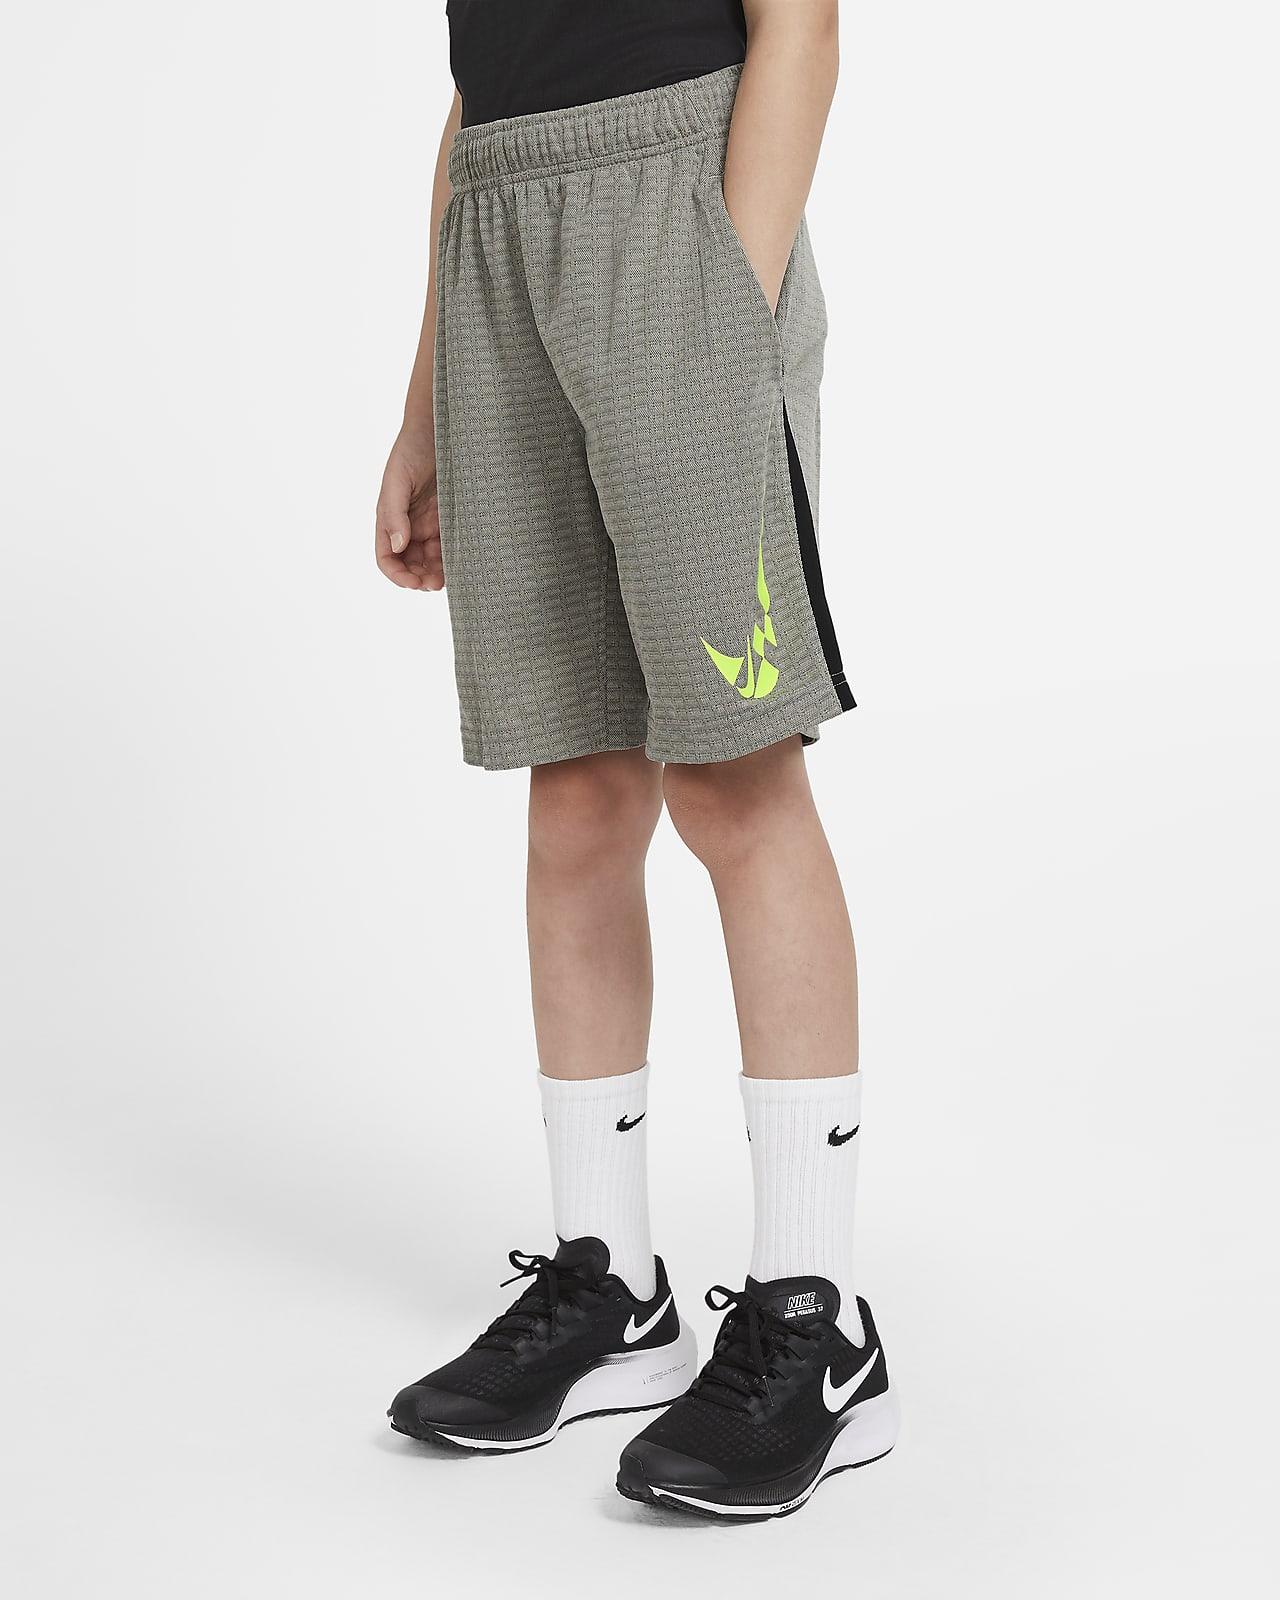 Nike Dri-FIT Older Kids' (Boys') Graphic Training Shorts